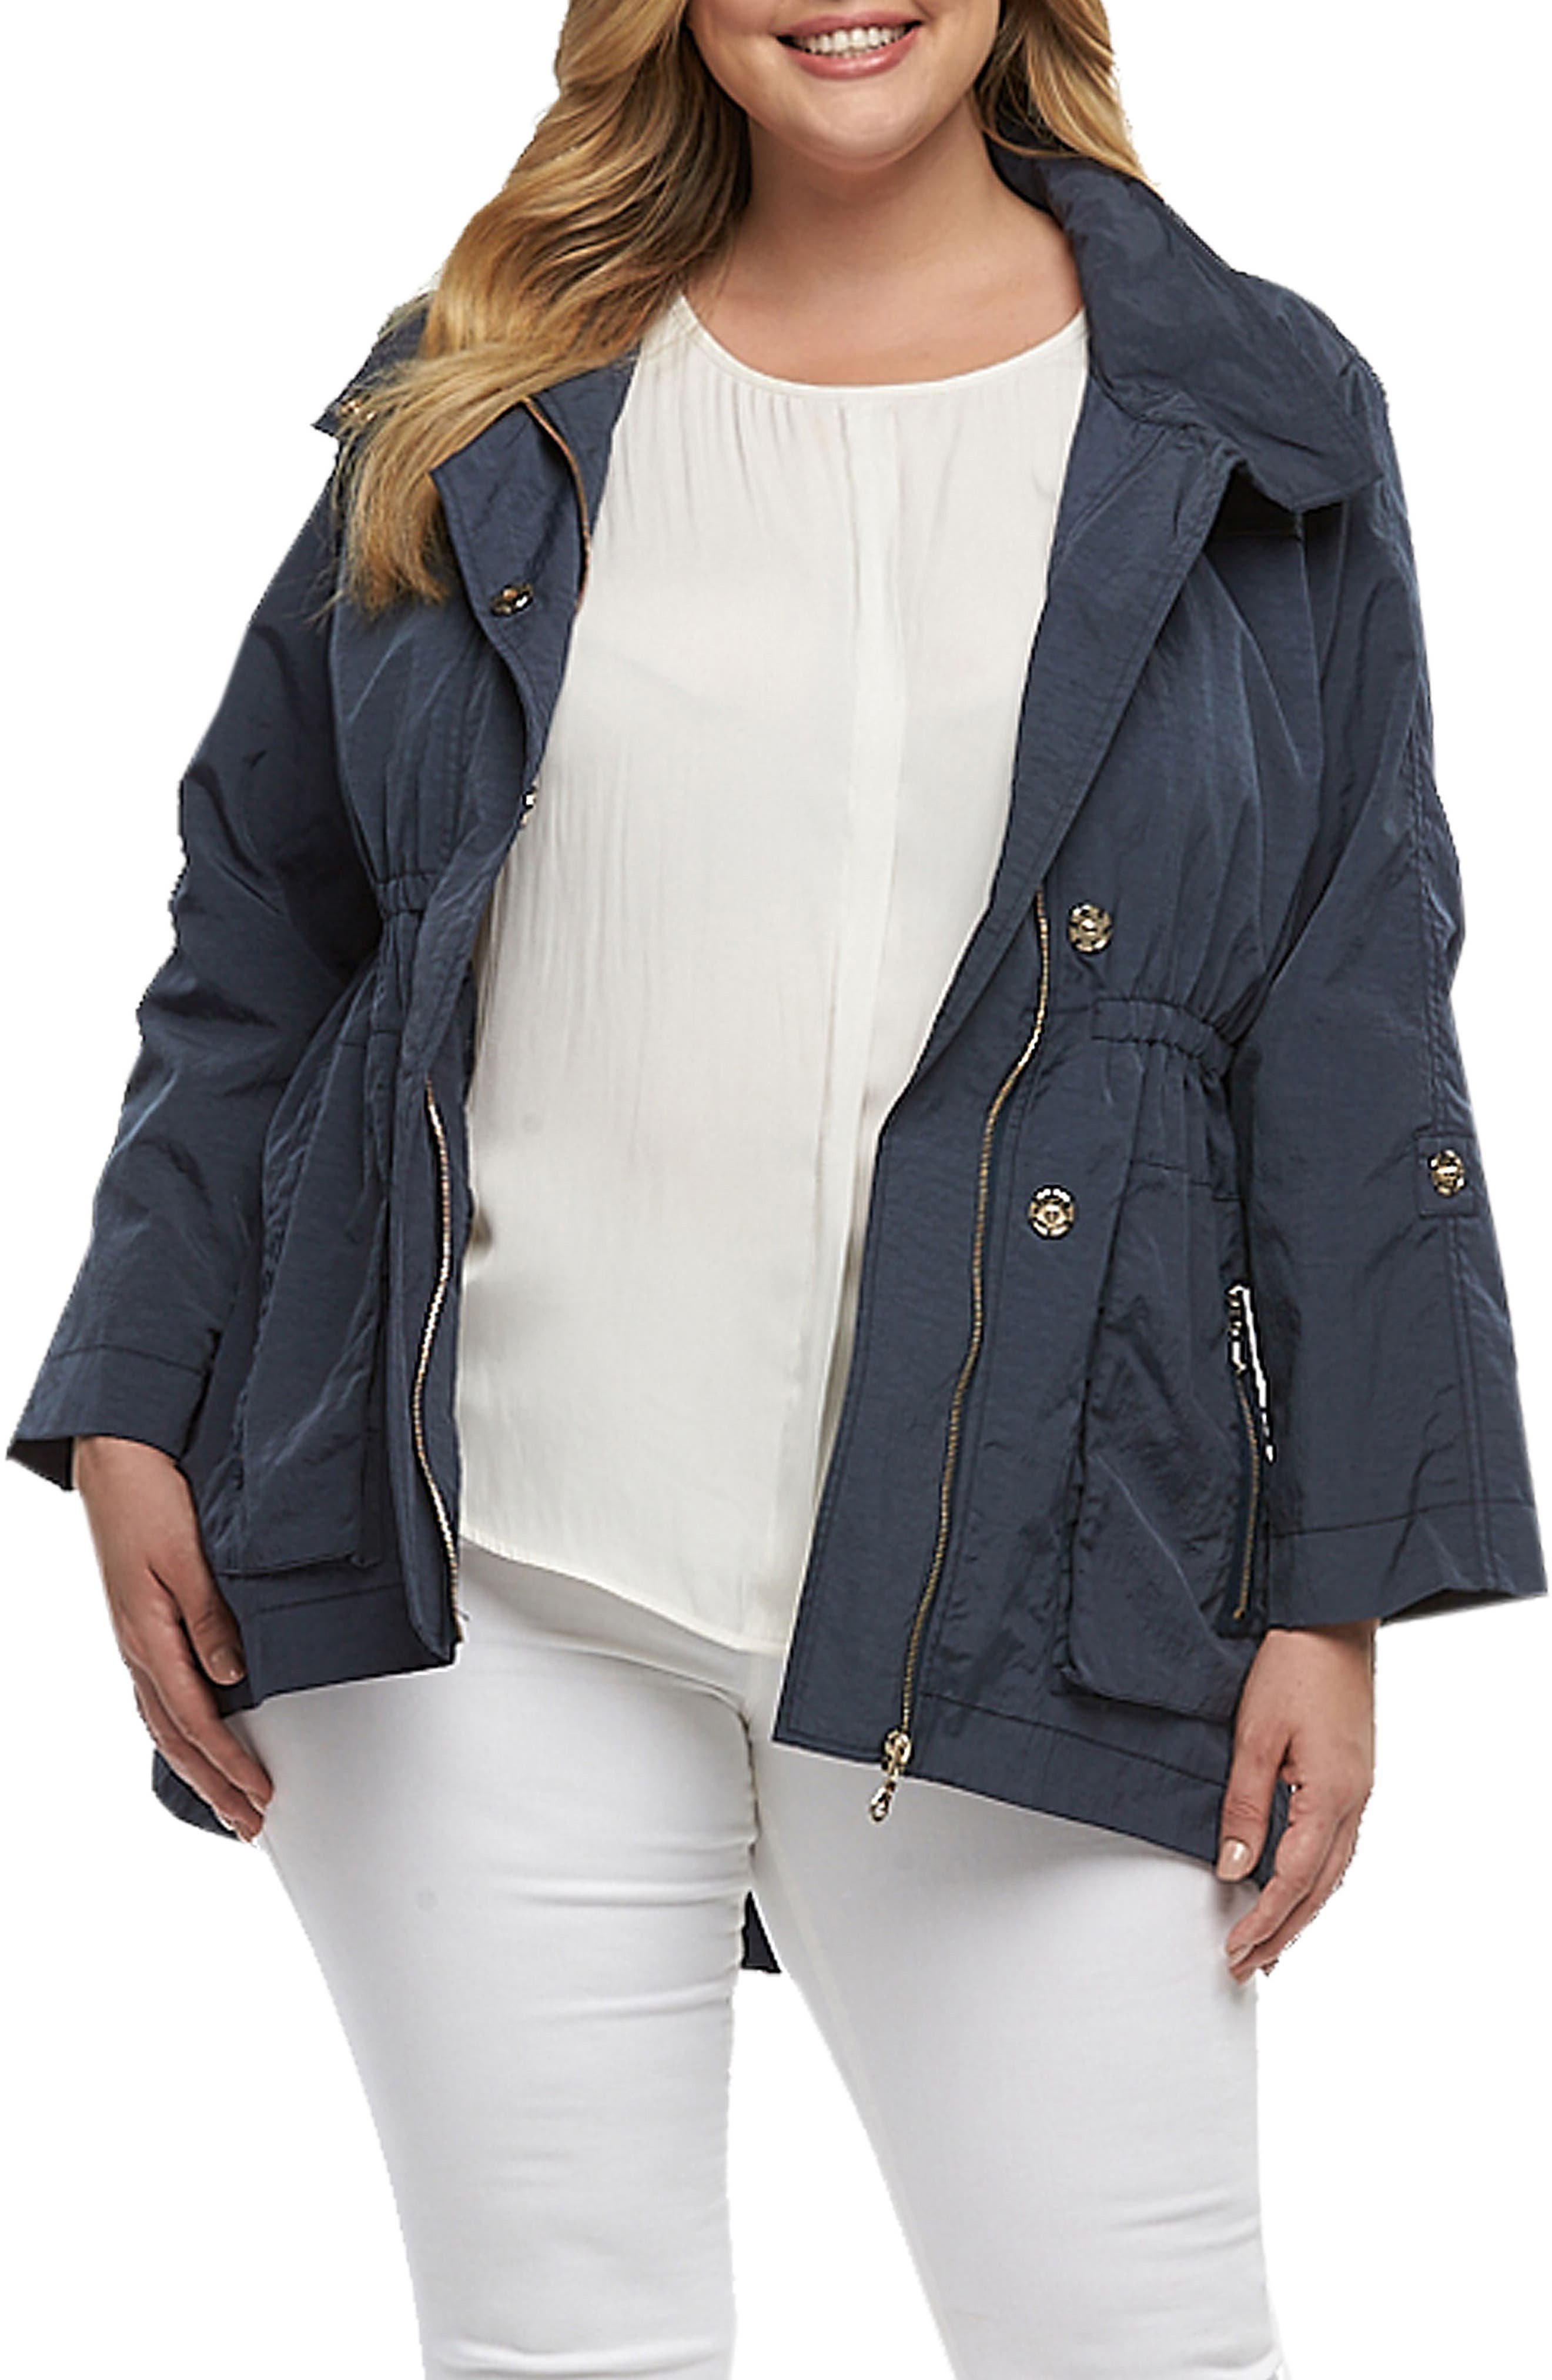 Cory Hooded Utility Jacket,                         Main,                         color,